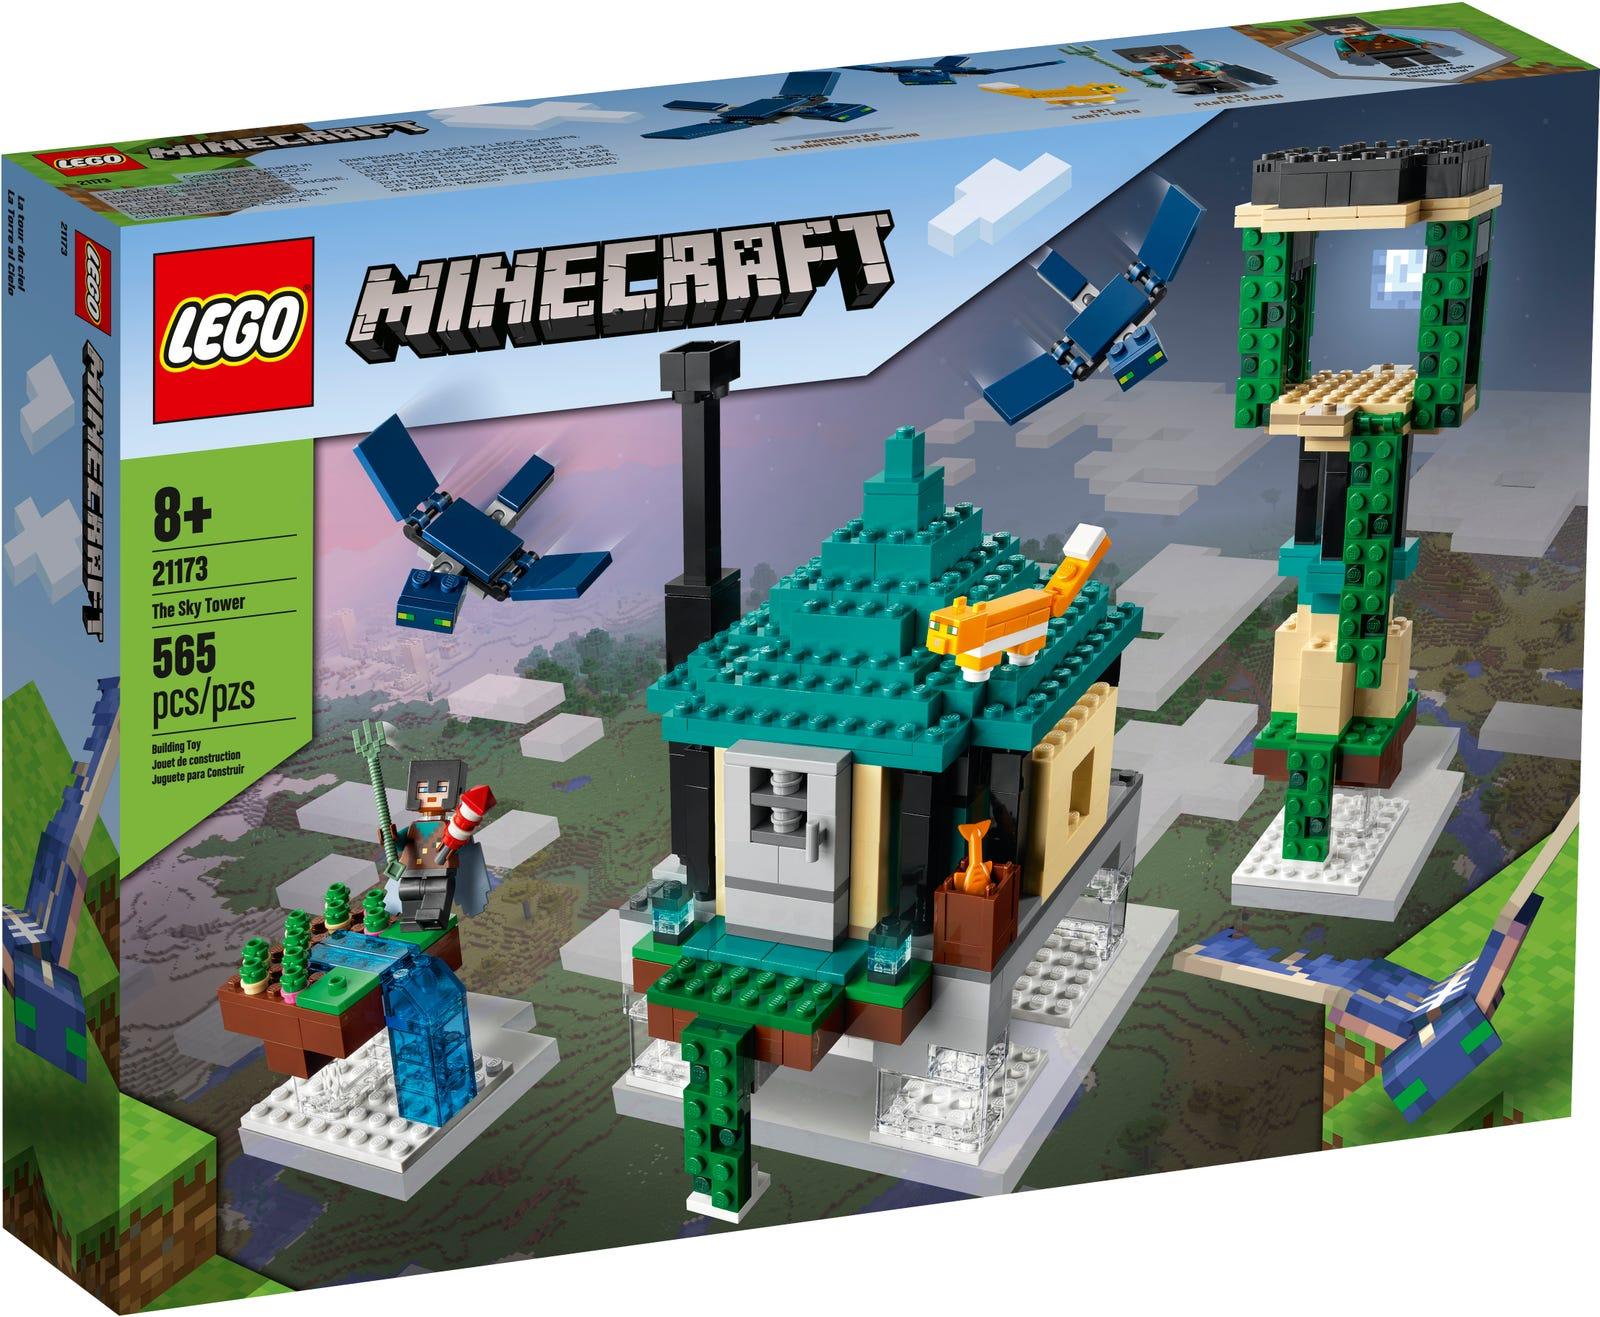 LEGO MINECRAFT SKY TOWER 21173